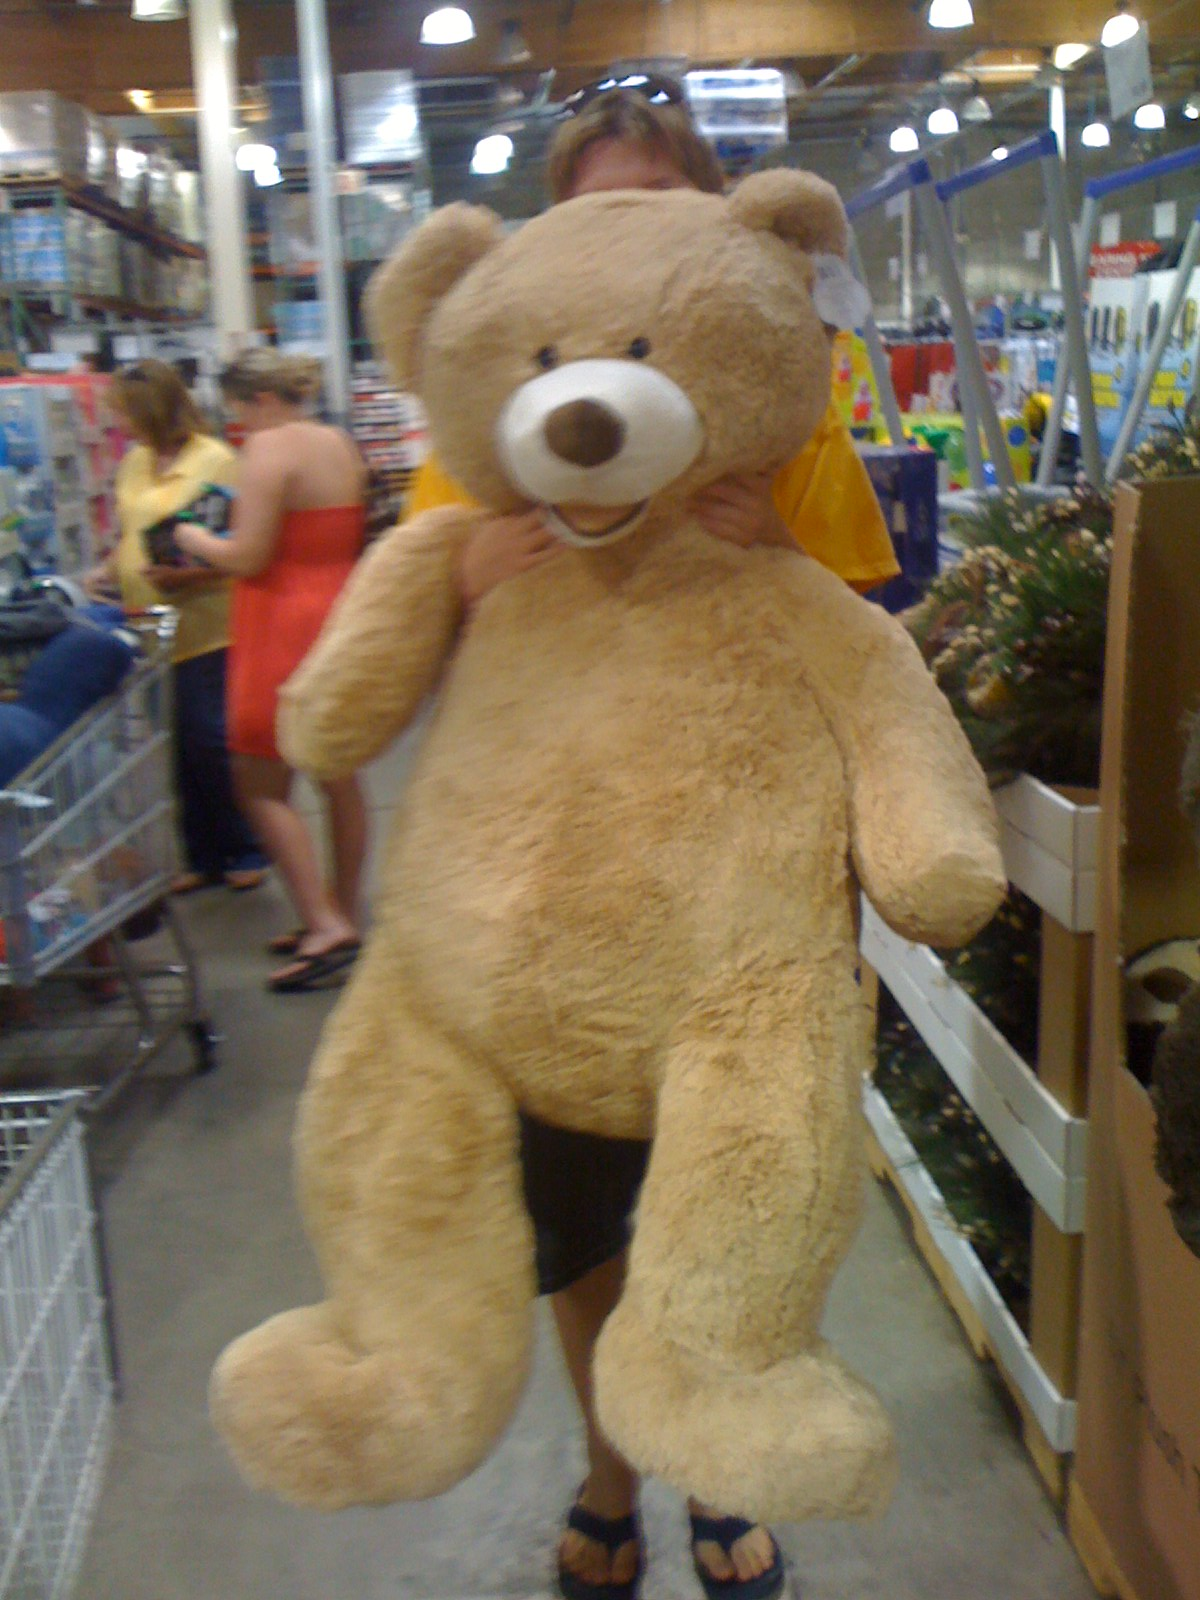 Giant Teddy Bear Walmart